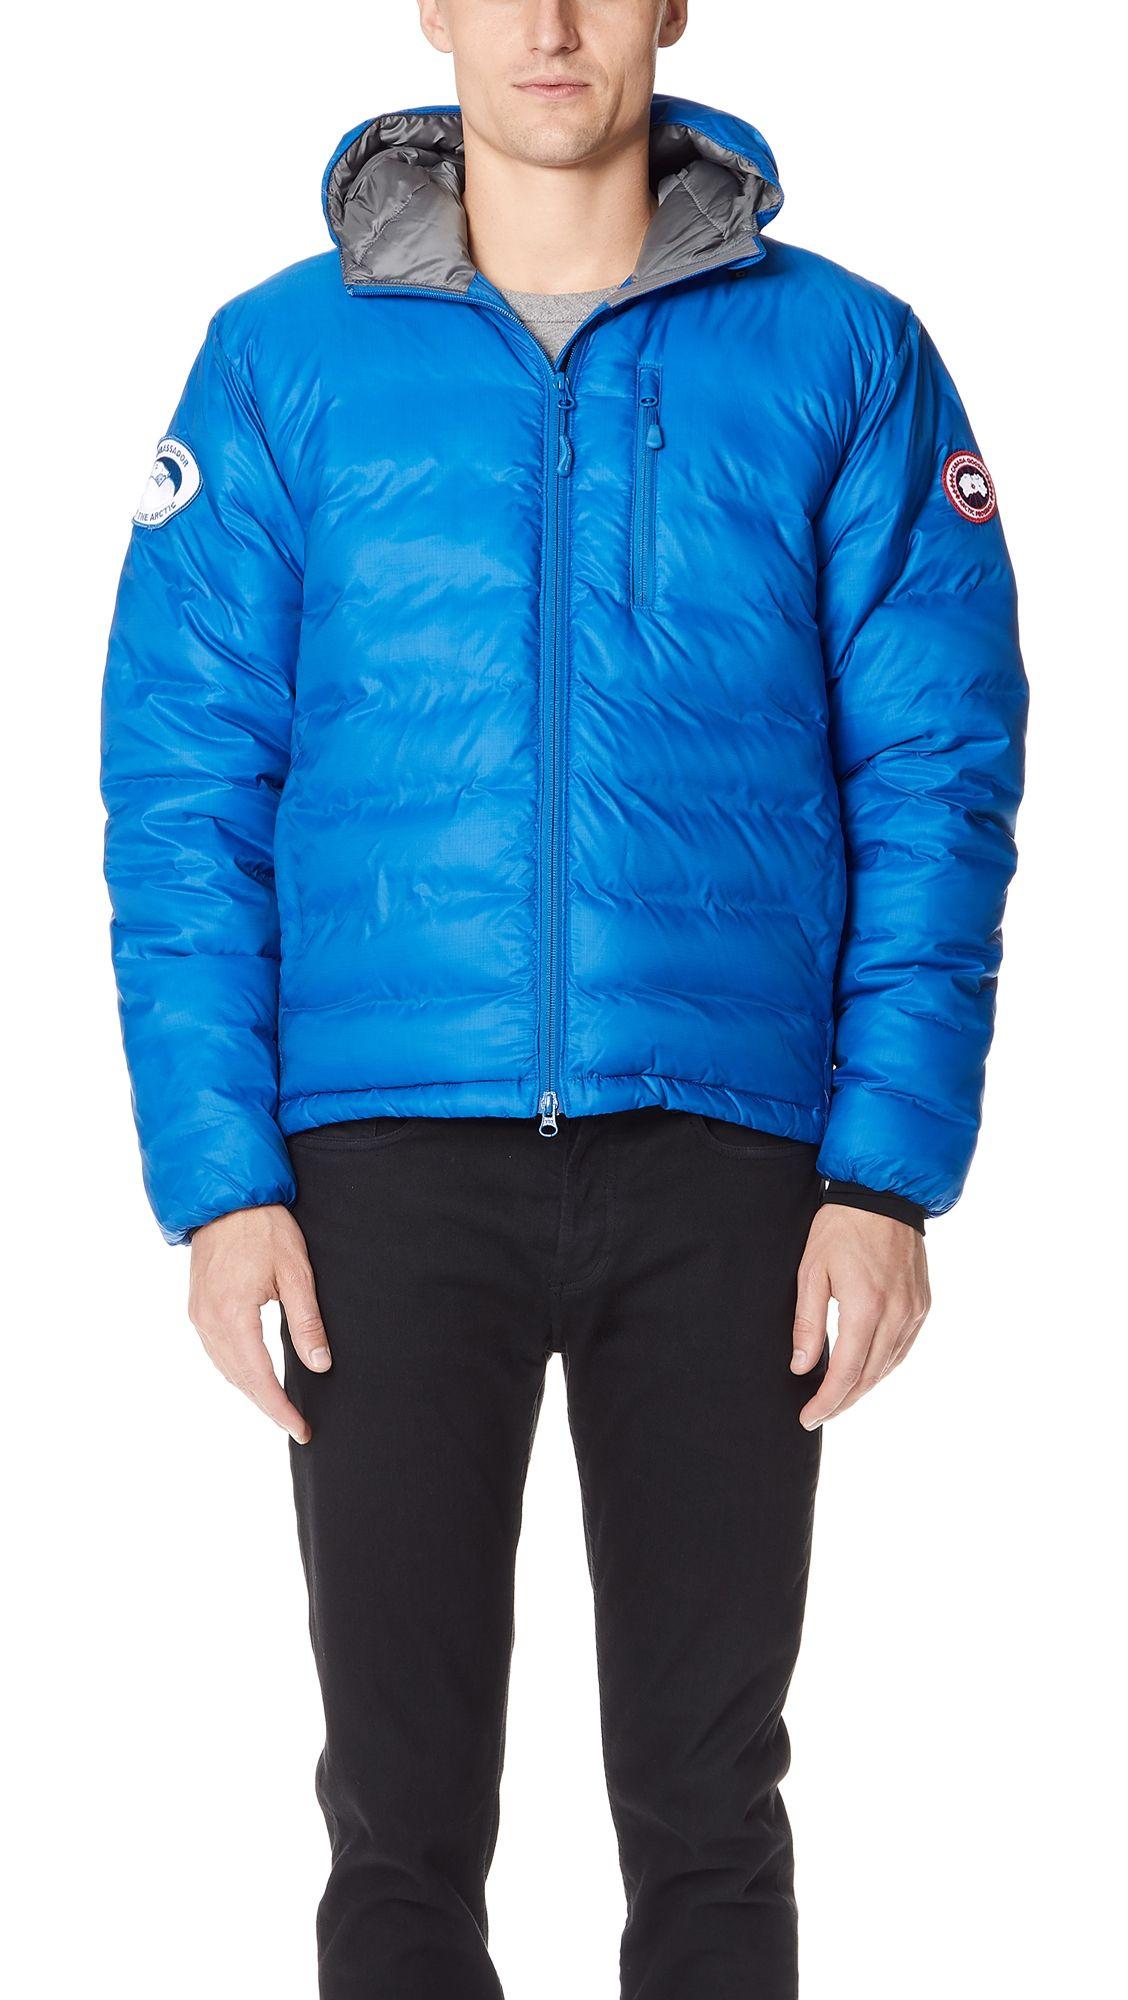 Canada Goose Lodge Hooded Jacket Canadagoose Cloth Canada Goose Hooded Jacket Jackets Winter Jackets